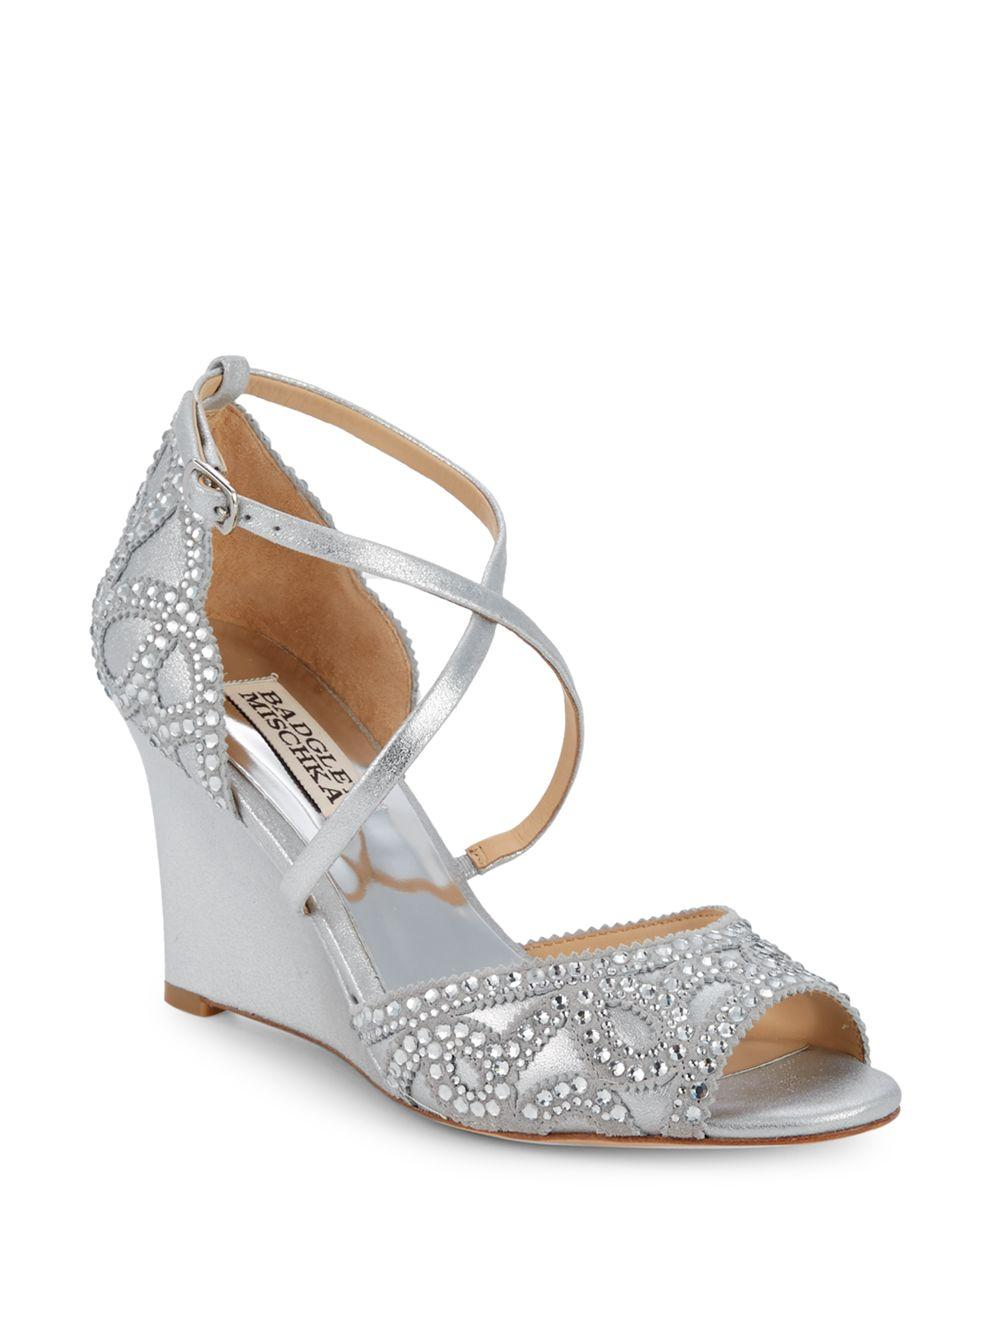 6e59aebe4de Badgley Mischka. Women s Metallic Embellished Leather Wedge Dress Sandals